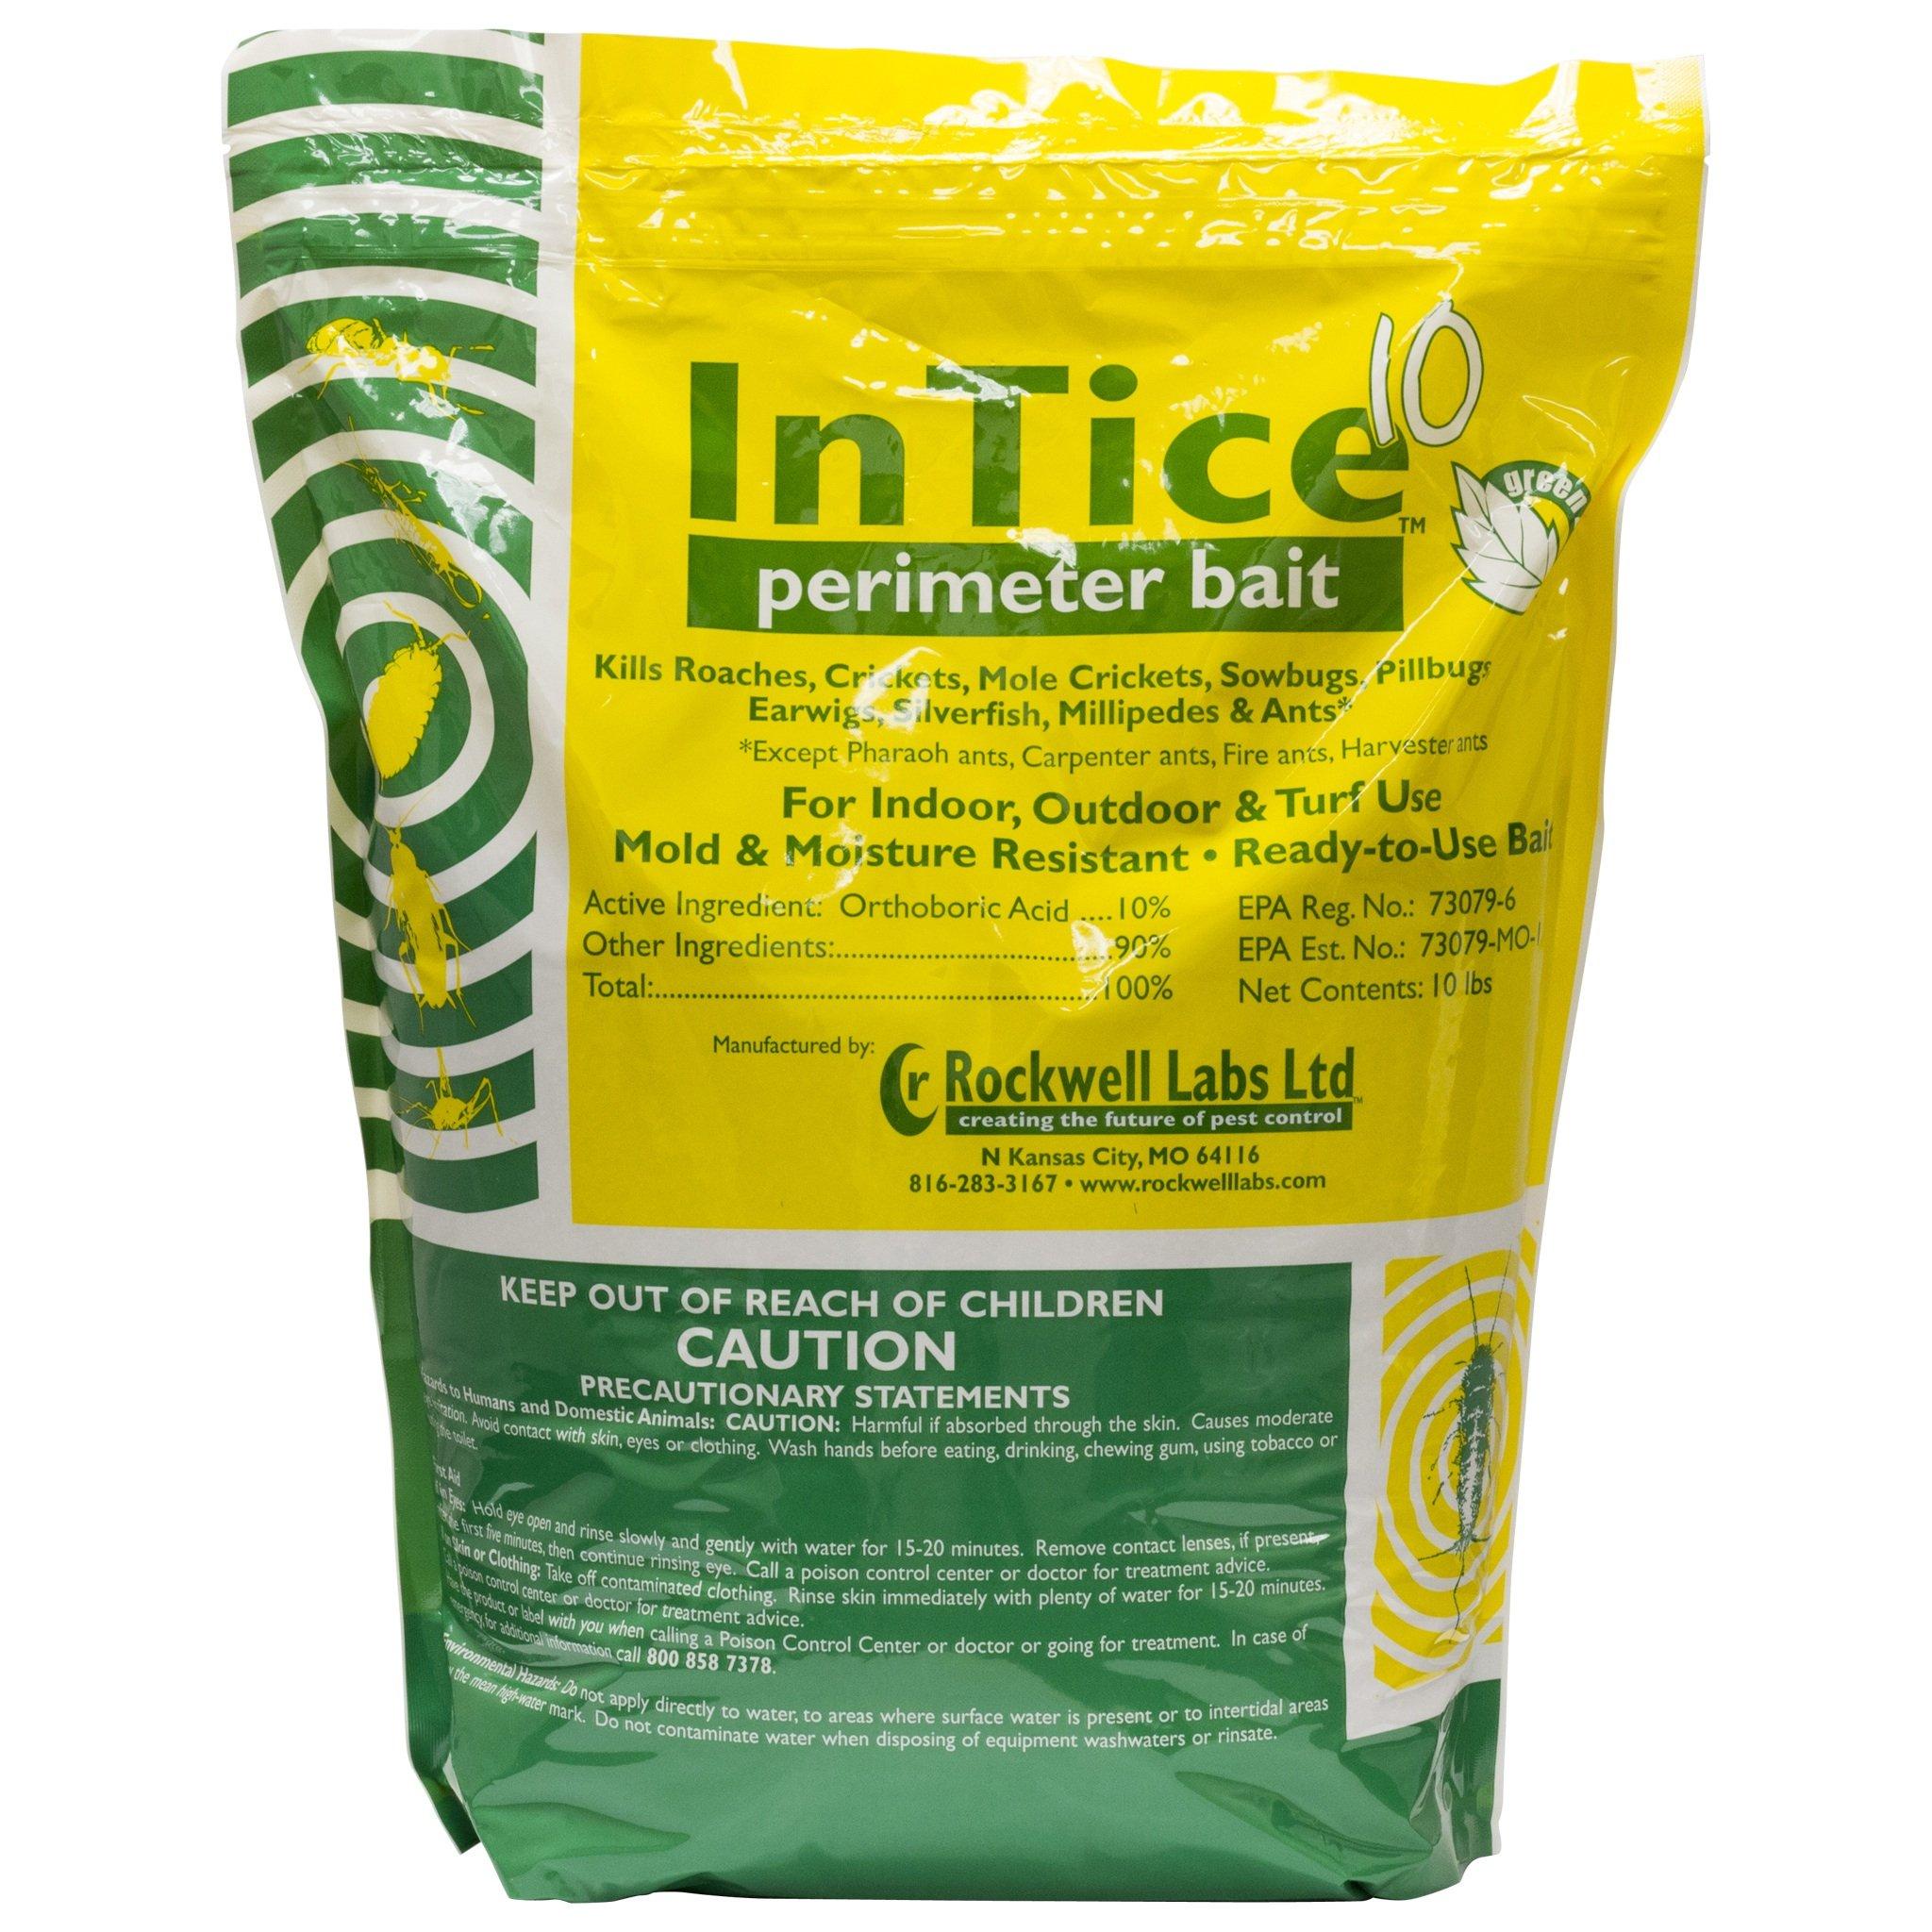 InTice 10 Perimeter Bait Ant and Roach Killer 10 Lb. Bag